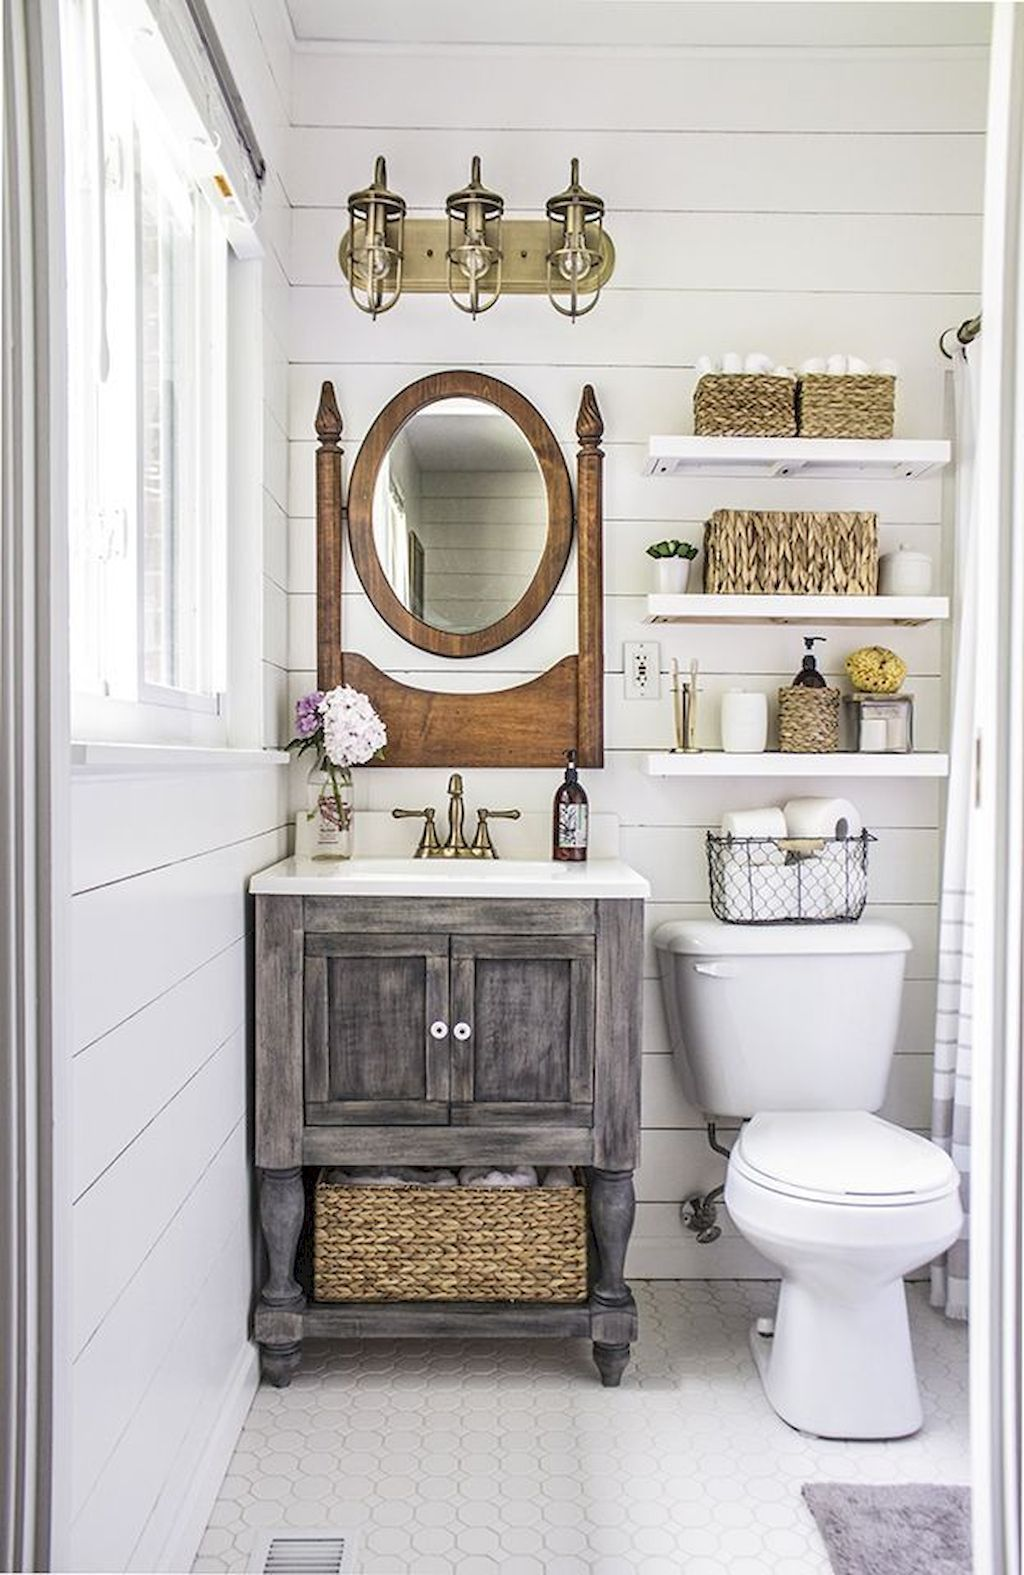 Stunning 45 Farmhouse Rustic Bathroom Decor Ideas on A Budget https ...